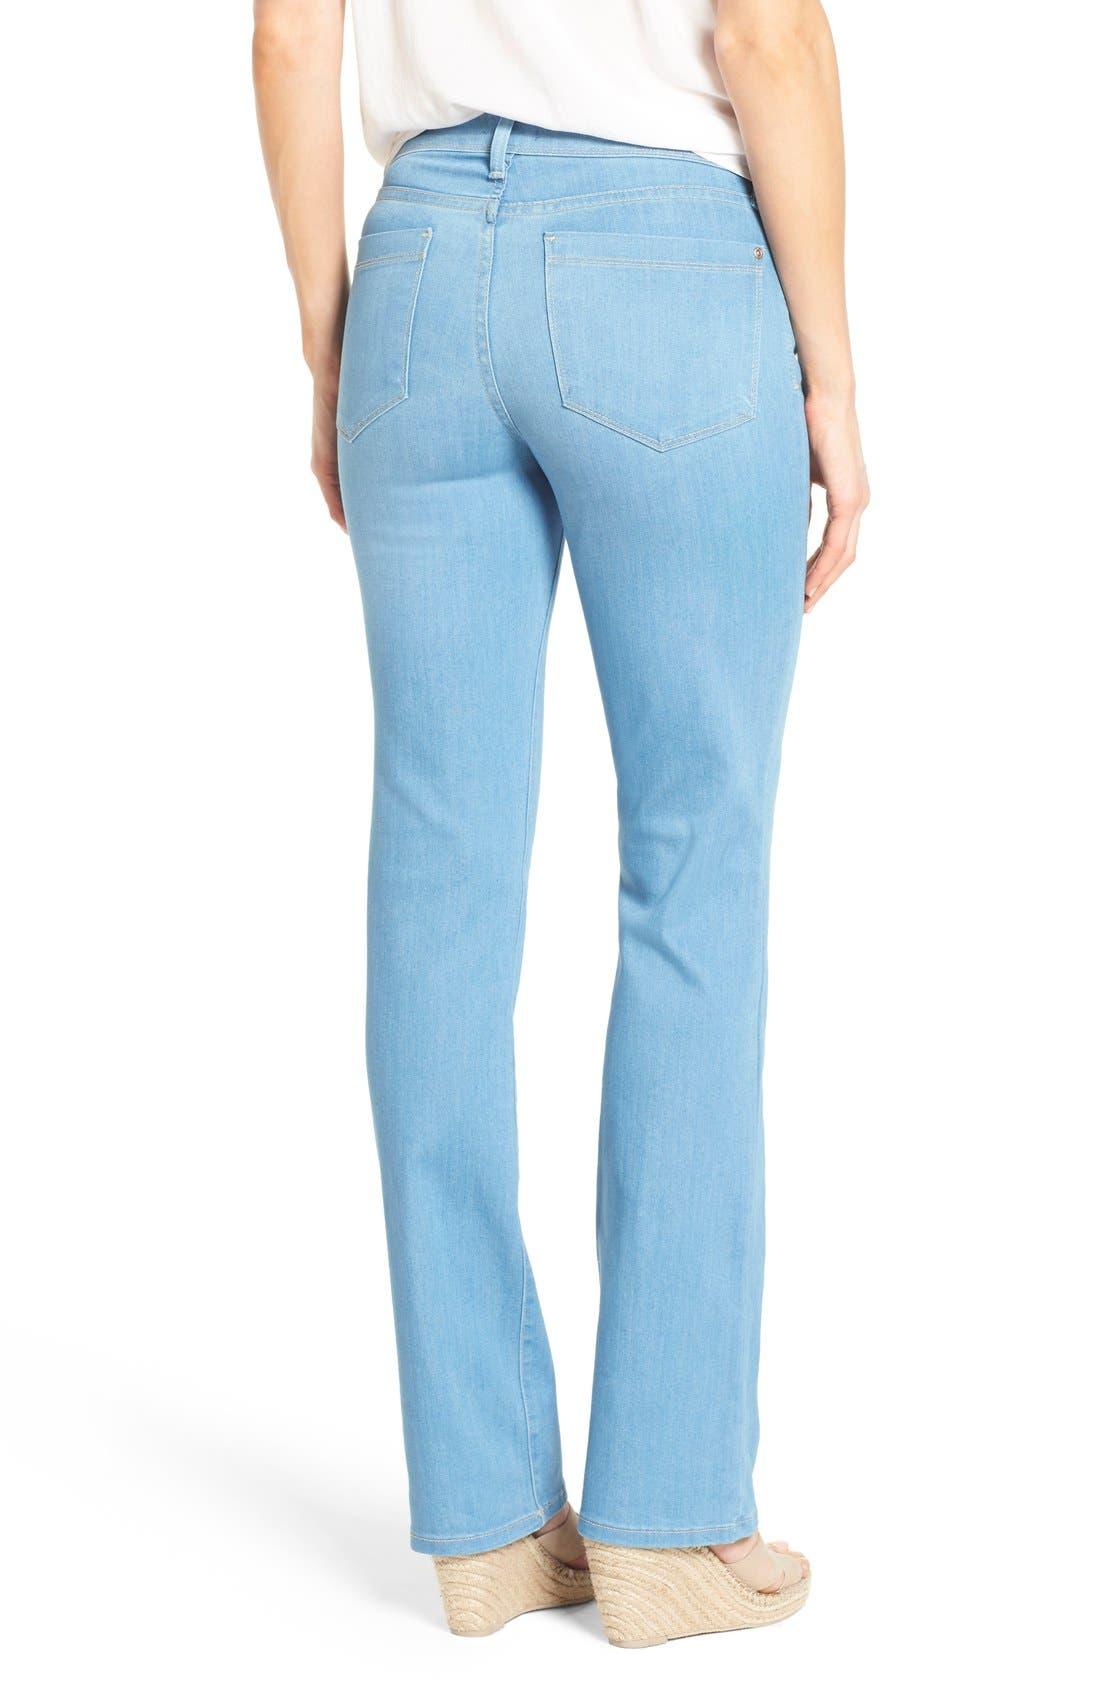 Alternate Image 2  - NYDJ 'Barbara' Stretch Bootcut Jeans (Palm Bay)